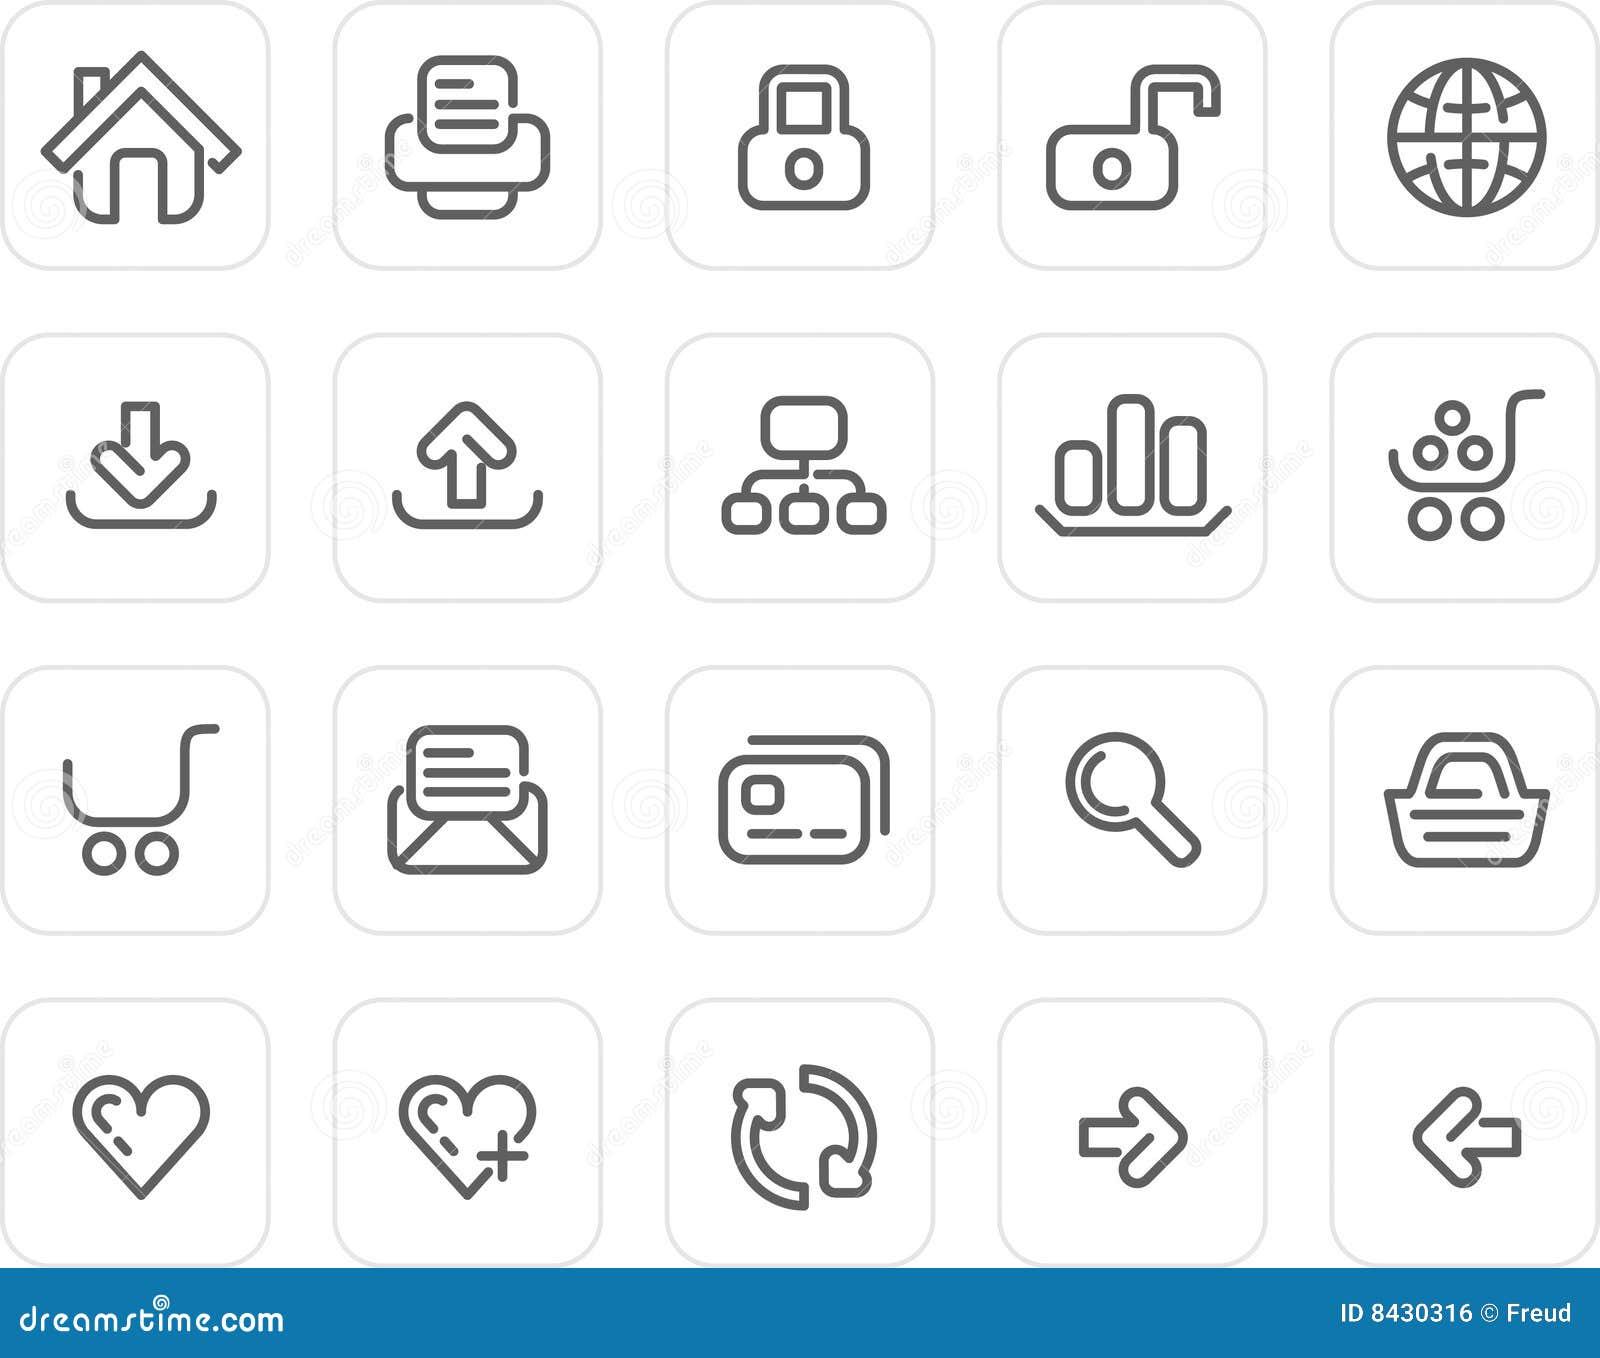 Plain icon set: Website and Internet